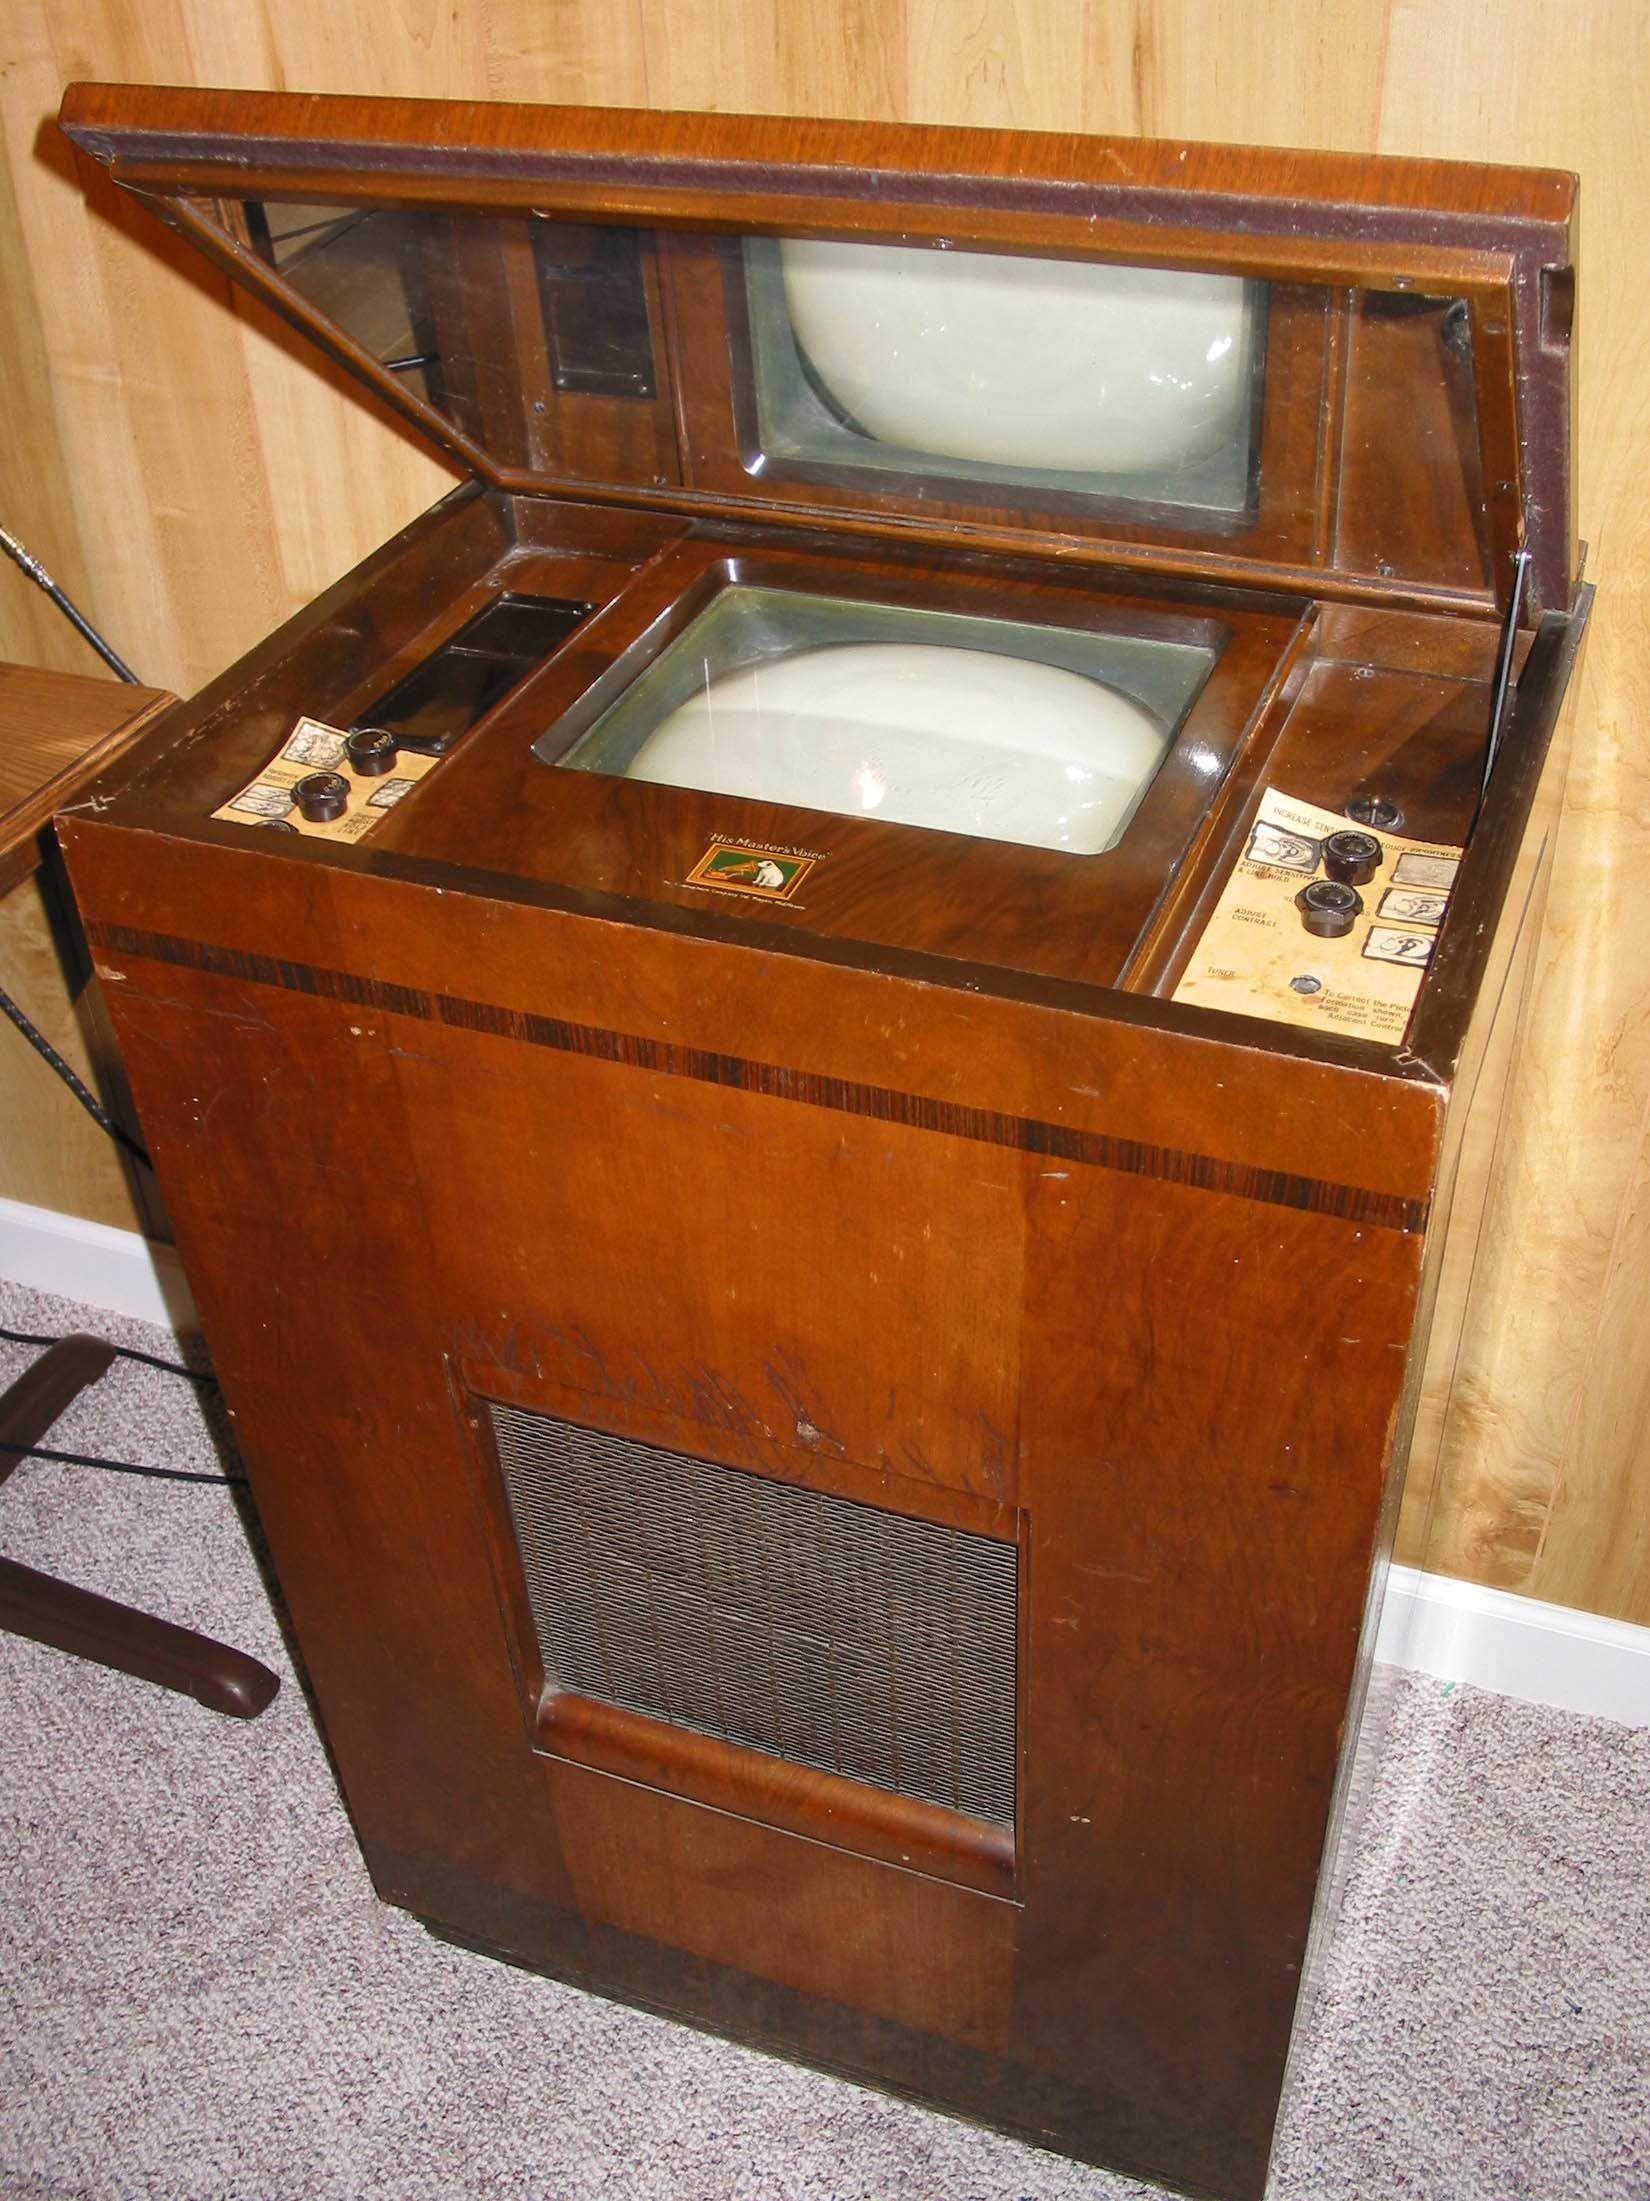 Television 1937